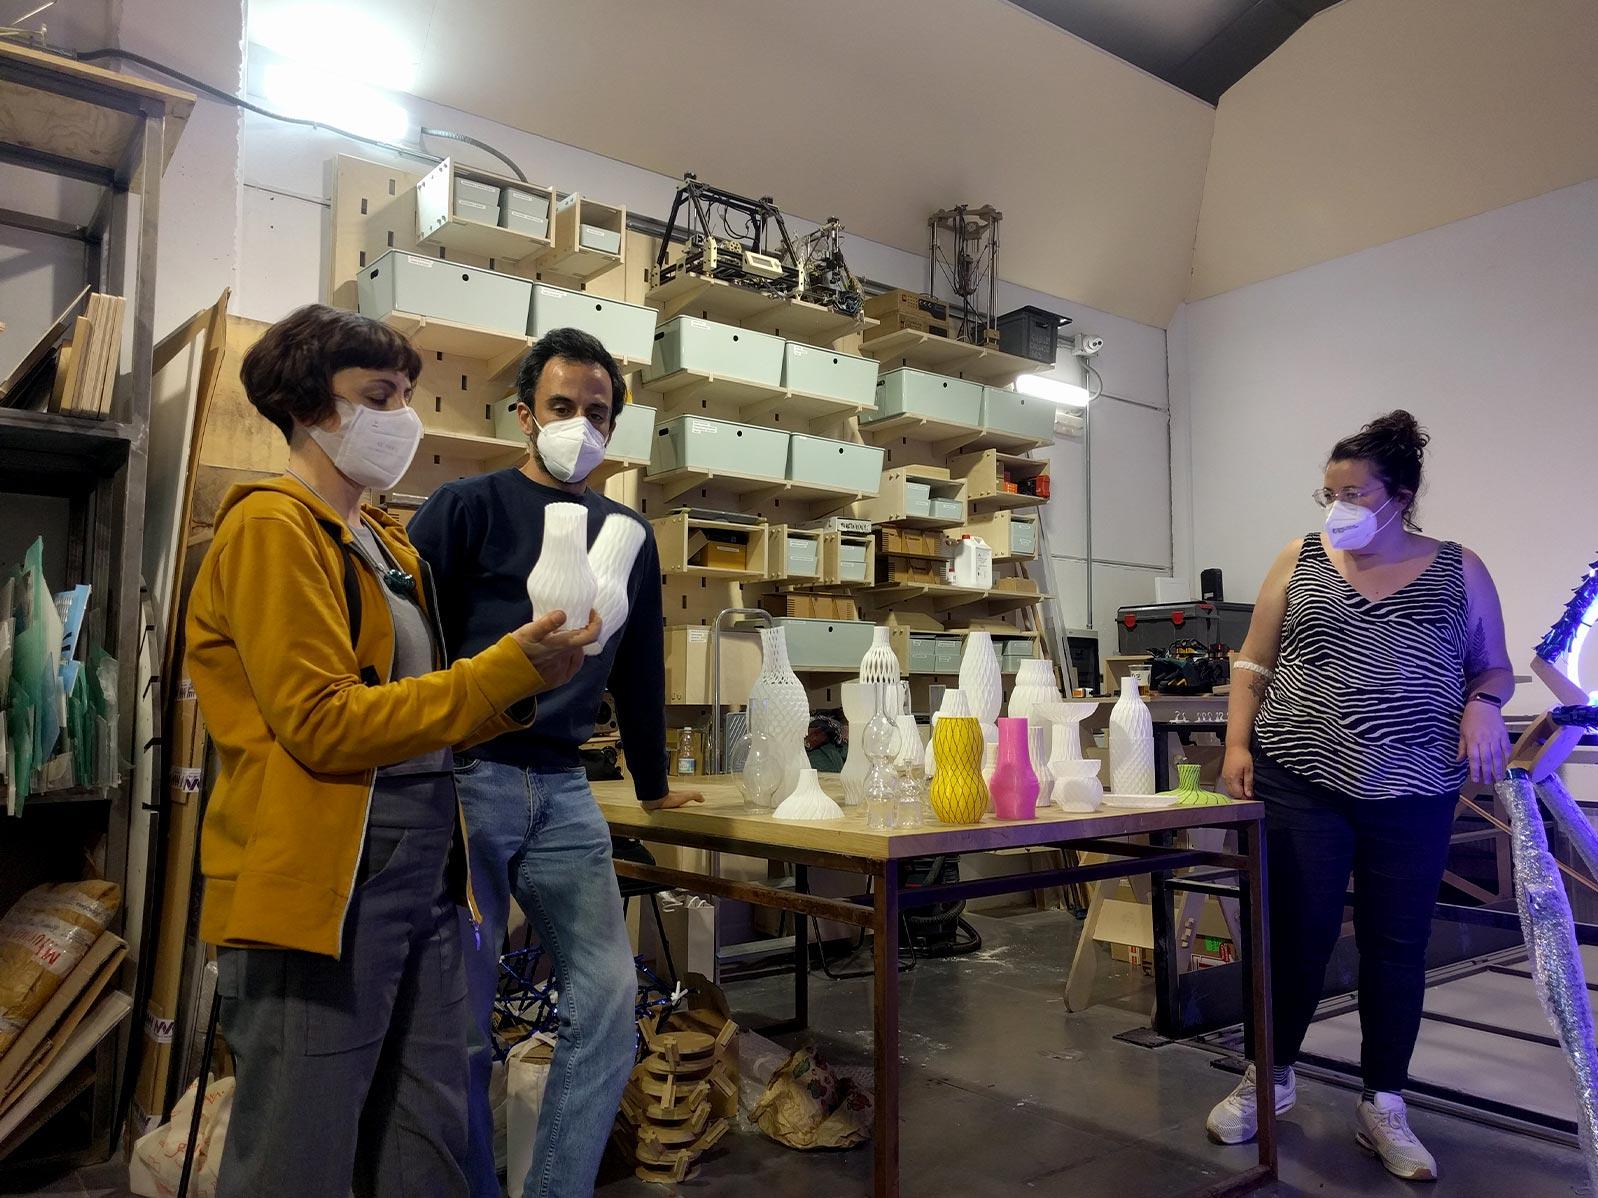 Marina Valls, Tiziana Chiara y Antonio Dominguez_ iAtelier_ EXarchitects